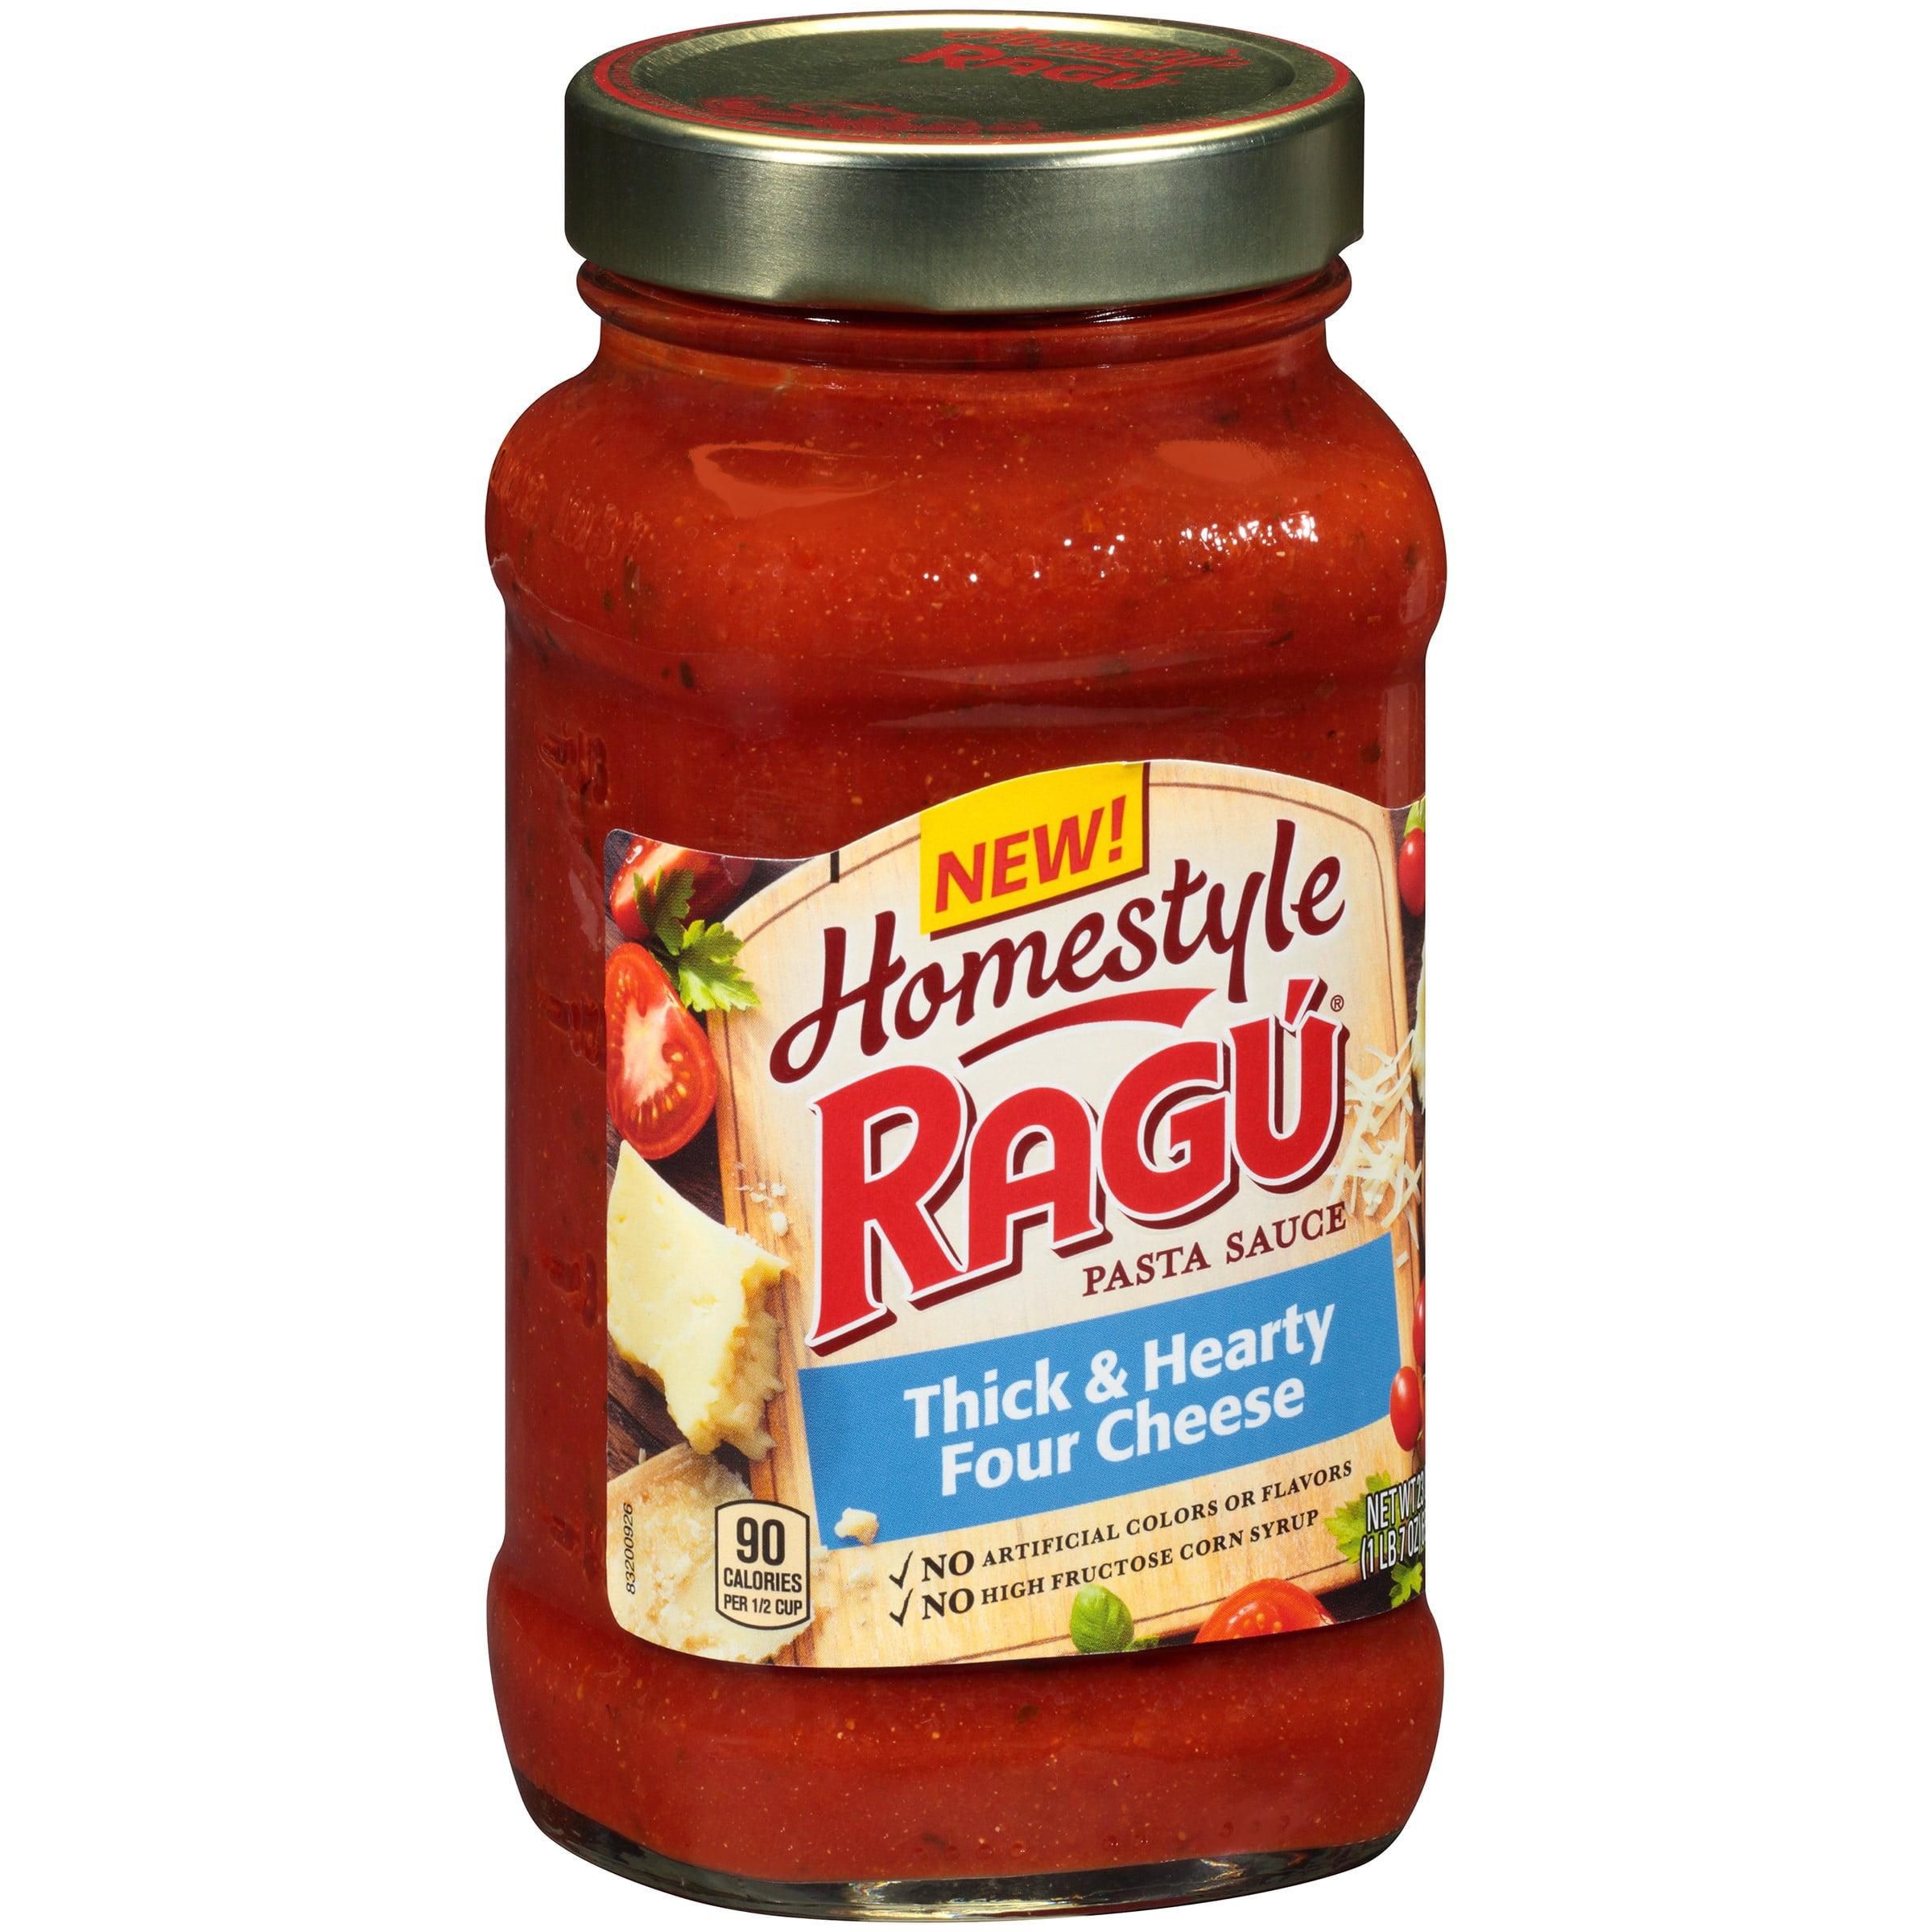 Homestyle Ragu Pasta Sauce Thick & Hearty Four Cheese, 23.0 OZ by Mizkan Americas, Inc.